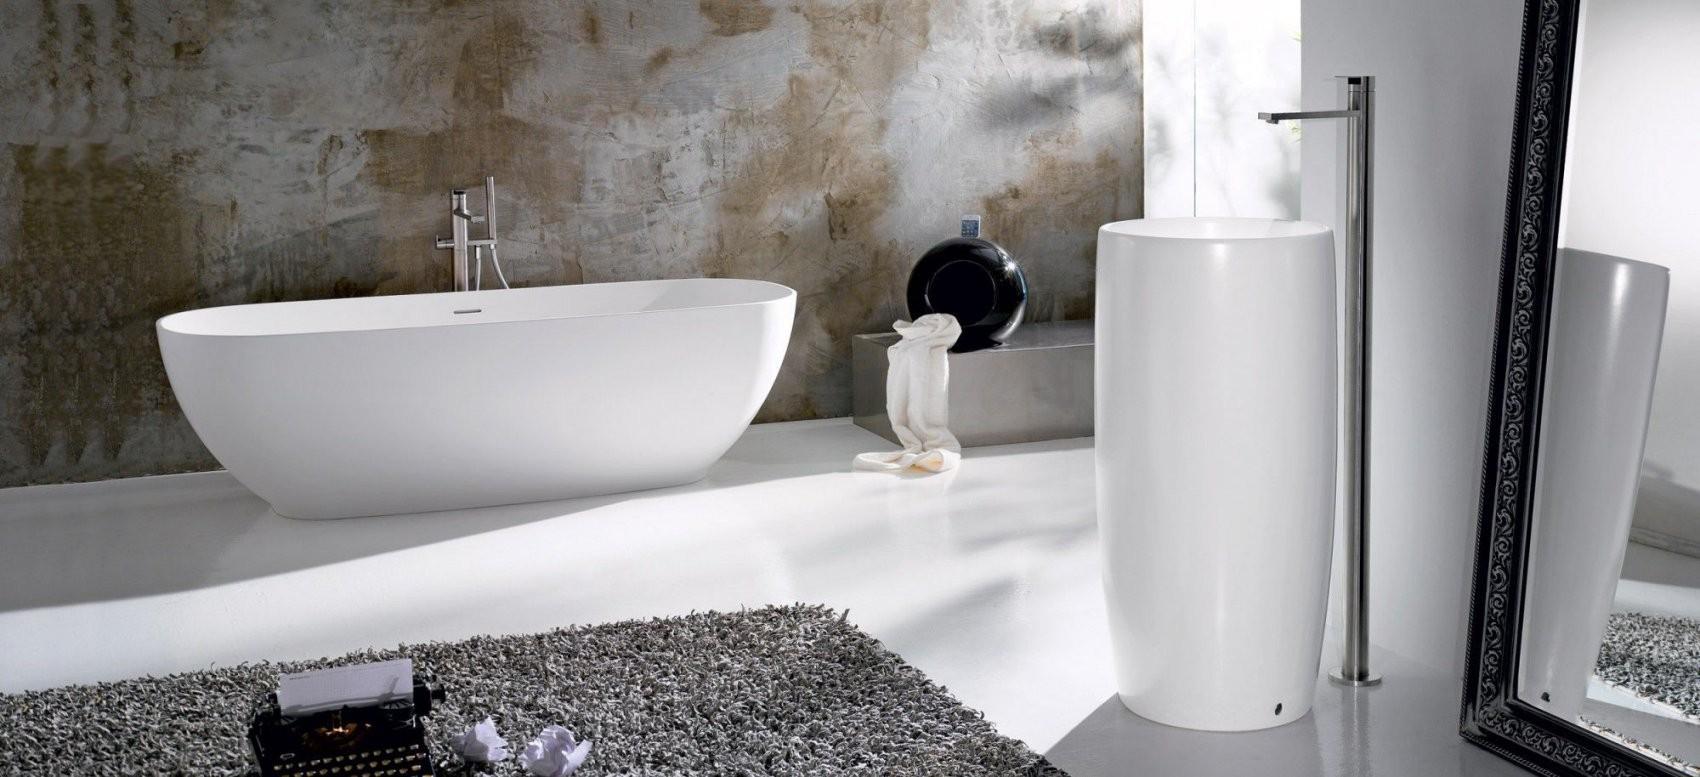 Freistehende Badewanne  Oval  Keramik  Pillar  A E T Italia von Freistehende Badewanne Keramik Photo